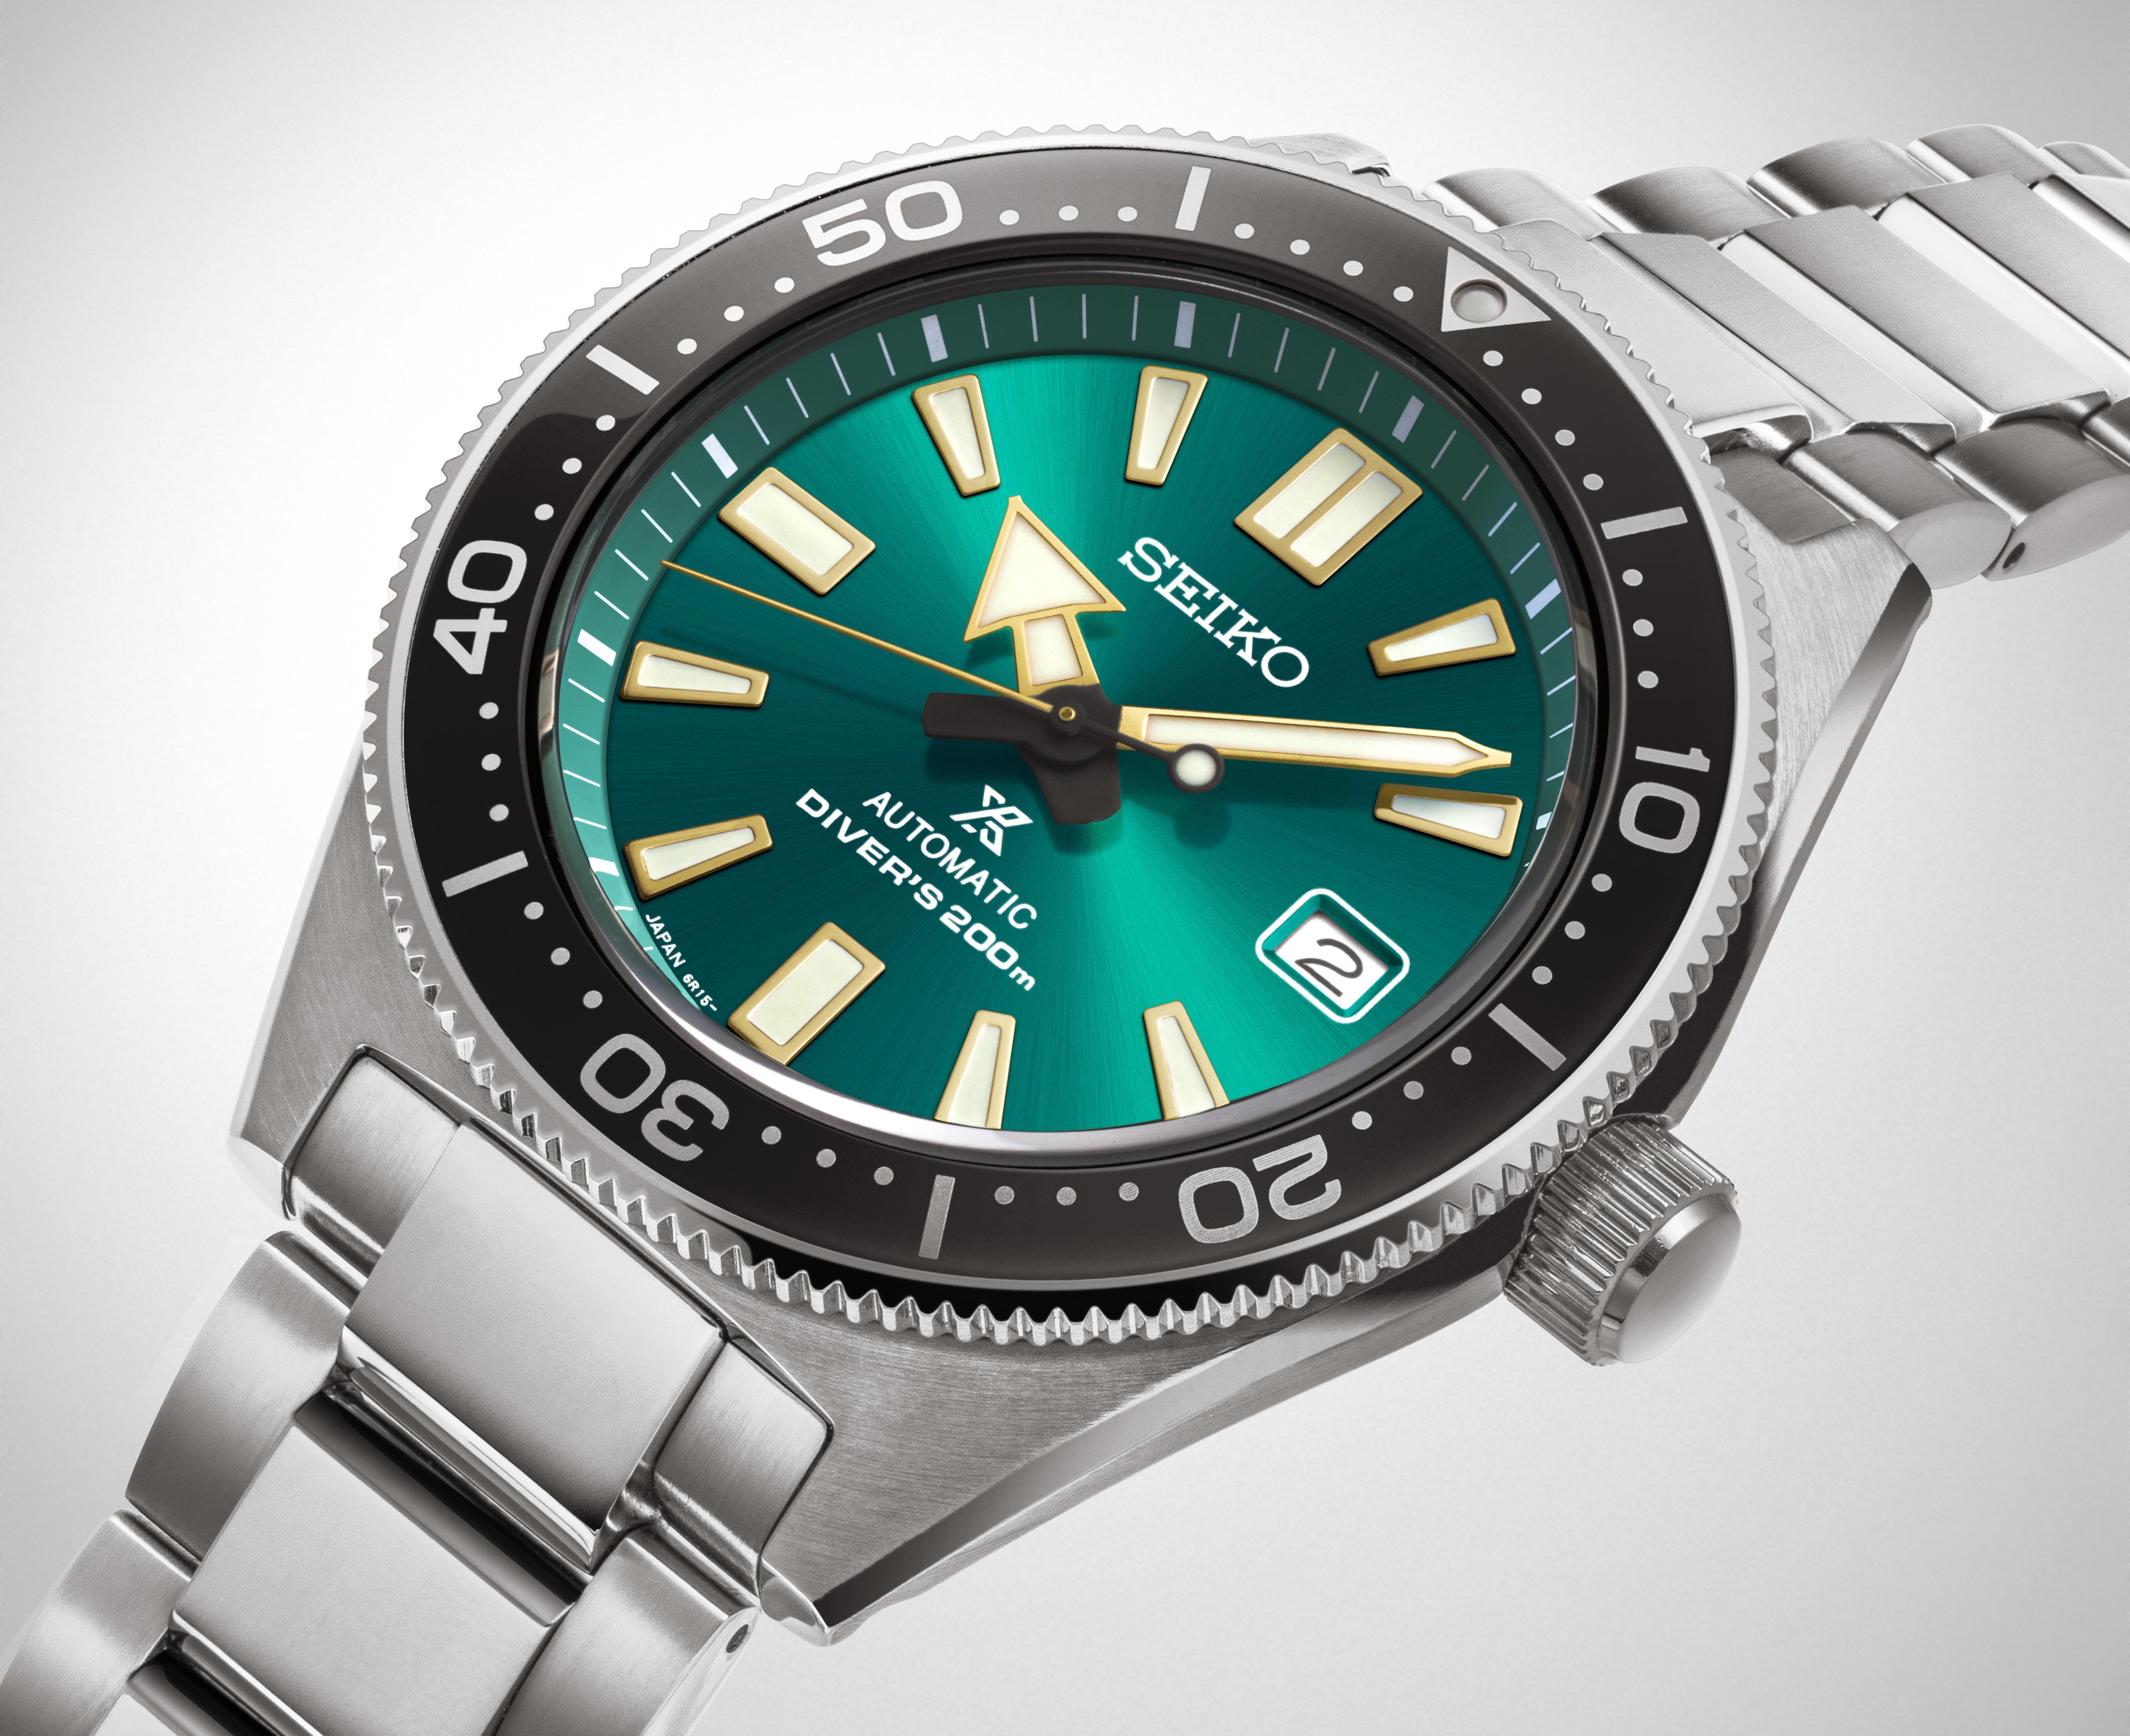 4df90e506dc15c Prospex Automatic Diver s 2018 Limited Edition